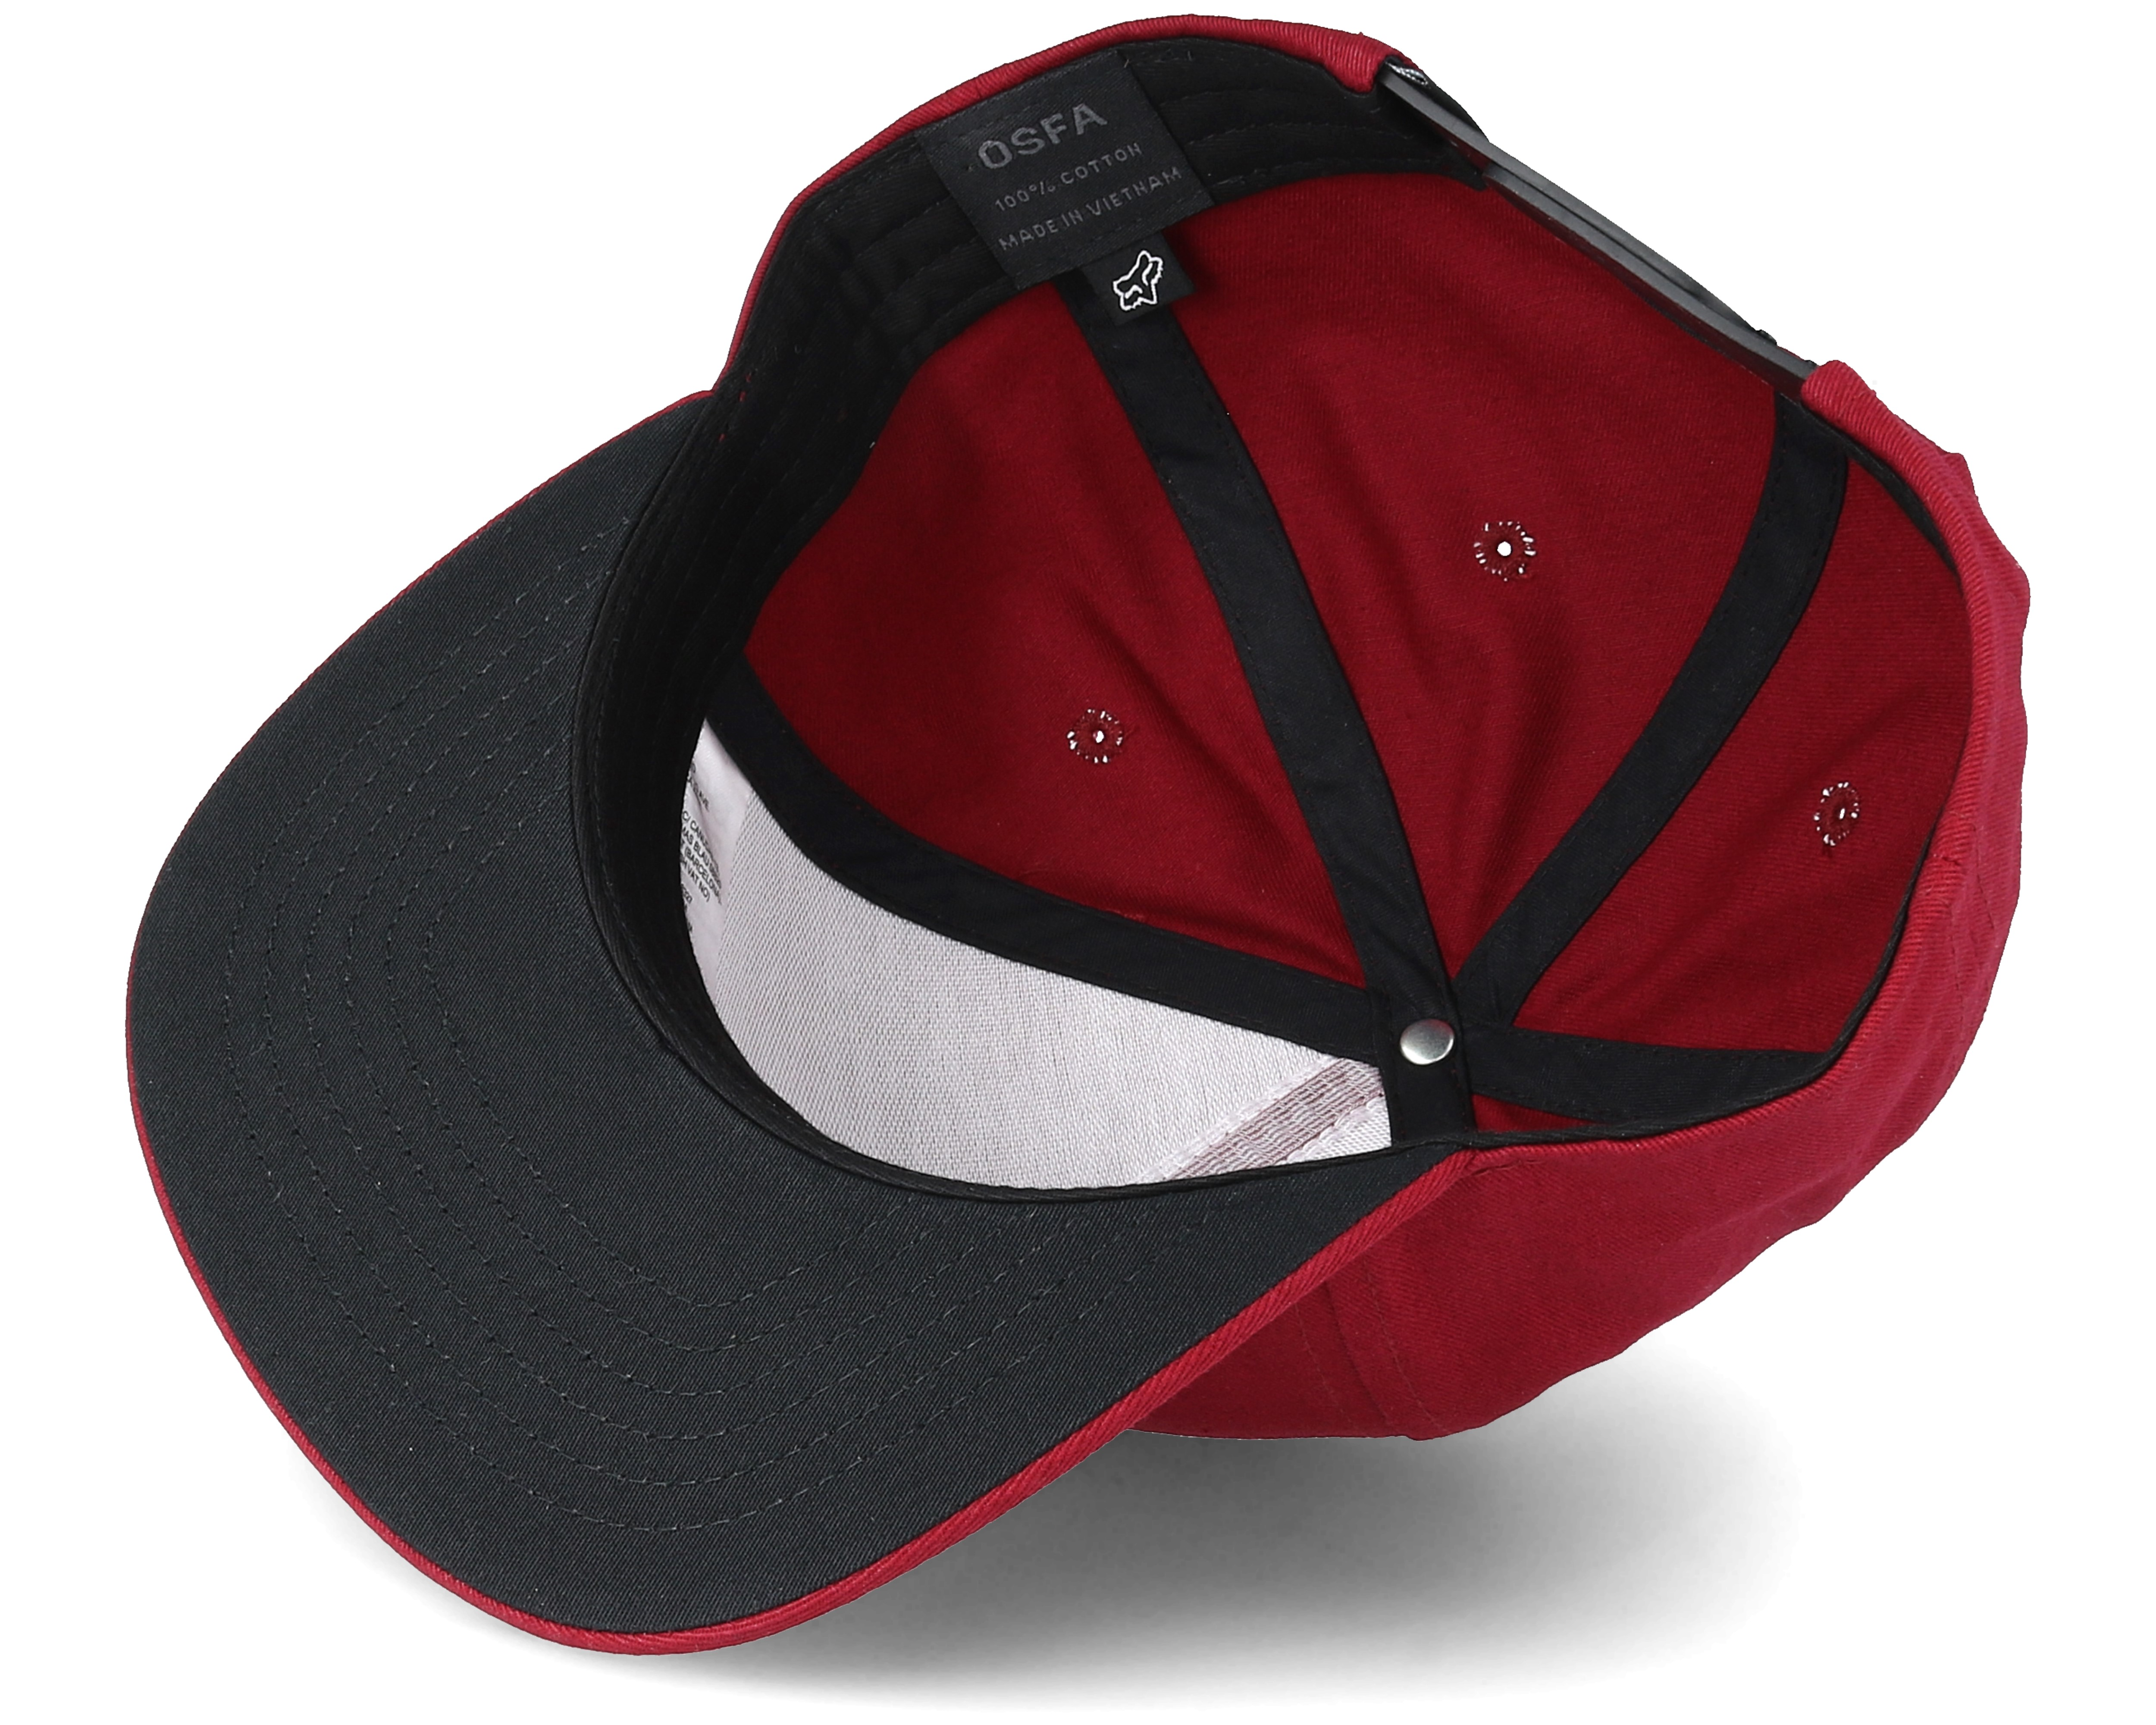 new styles d1a07 3aeb0 ... back red trucker cap hat losangeleswreckless snapbackballcap 34ee3  afc73  cheap ingratiate red snapback fox caps hatstore 4335e 7fa63